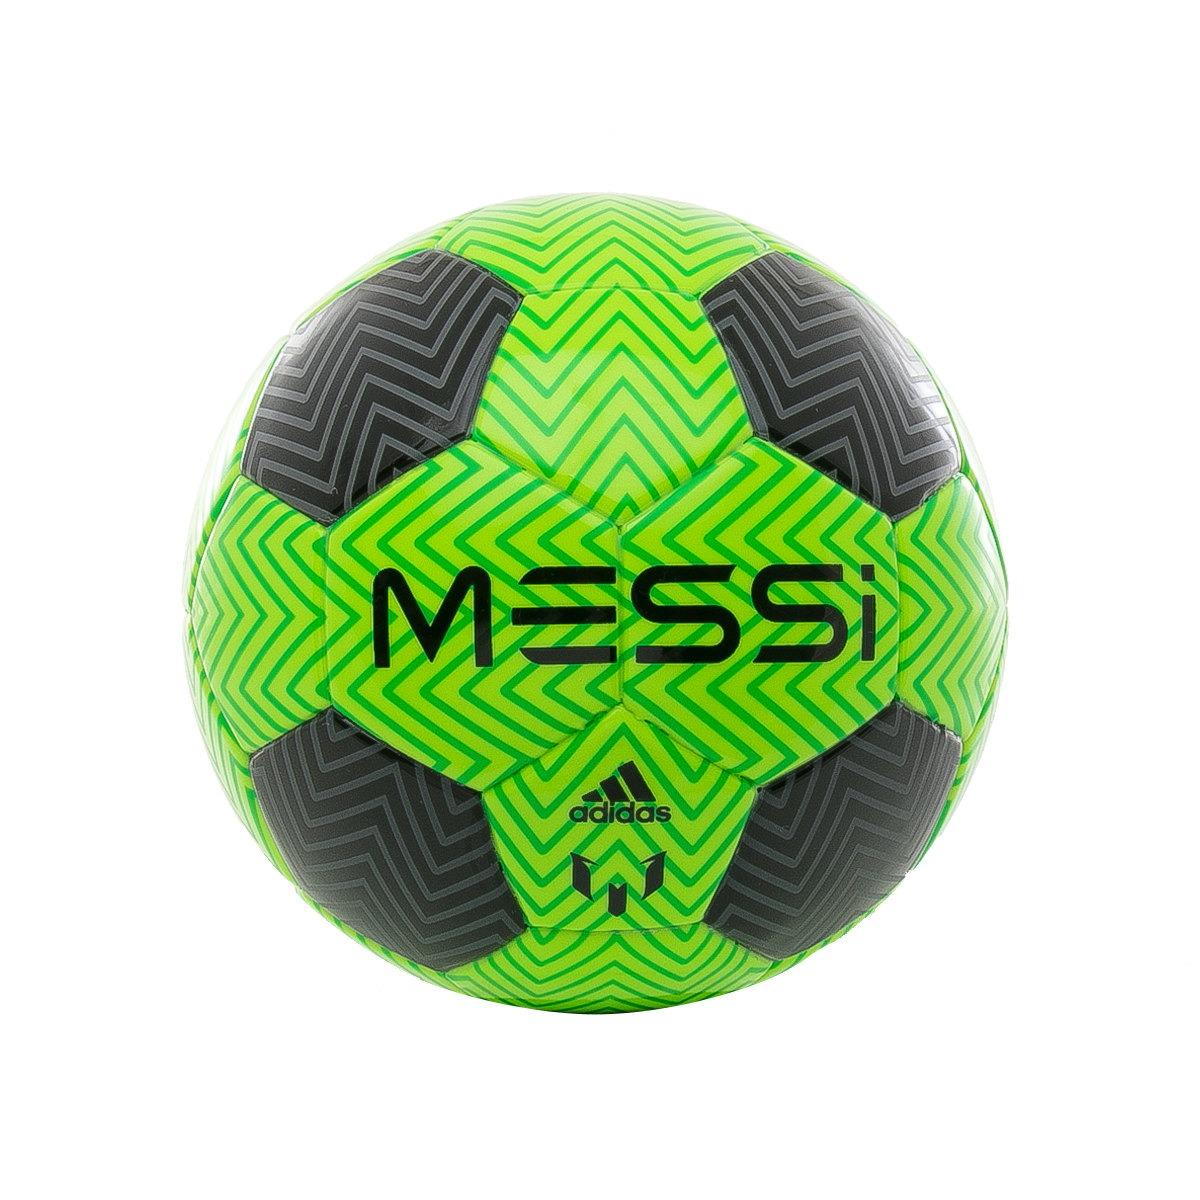 pelota mini messi q3 adidas. Cargando zoom. 19ae386102c7b